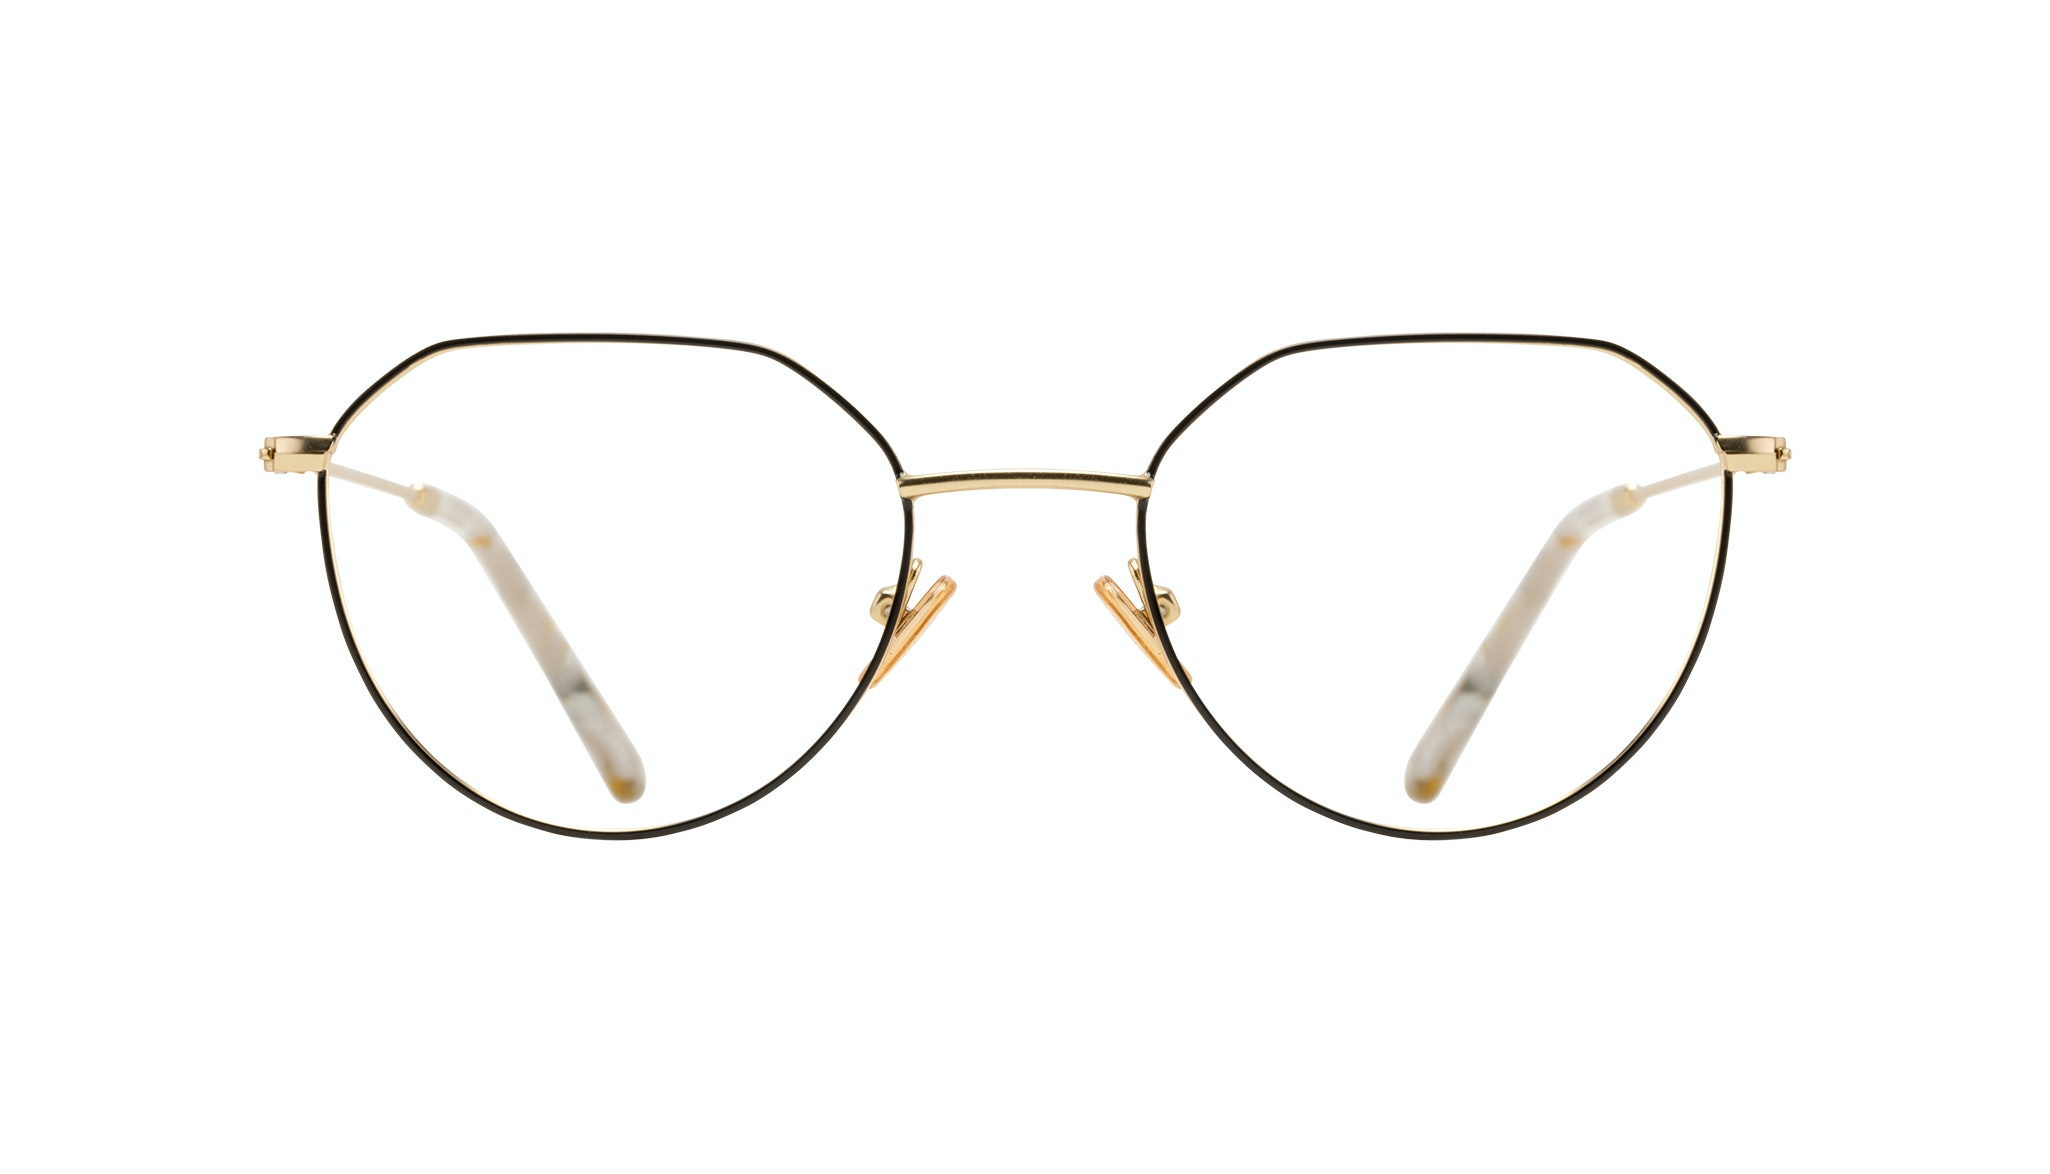 Affordable Fashion Glasses Round Eyeglasses Women Prism Deep Gold Front